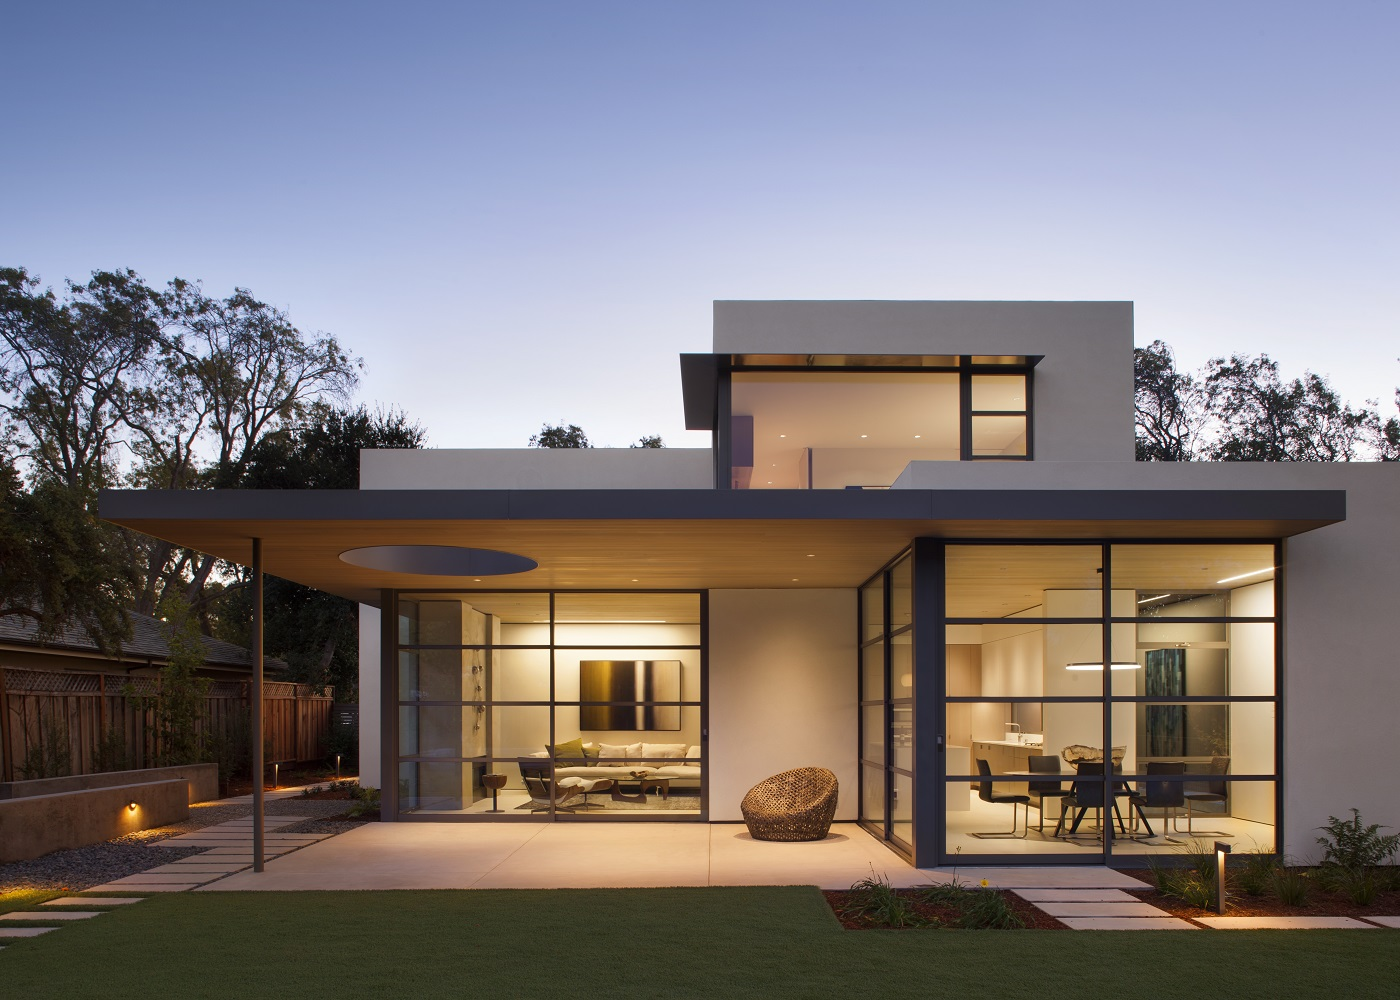 palo alto lantern house feldman architecture. Black Bedroom Furniture Sets. Home Design Ideas